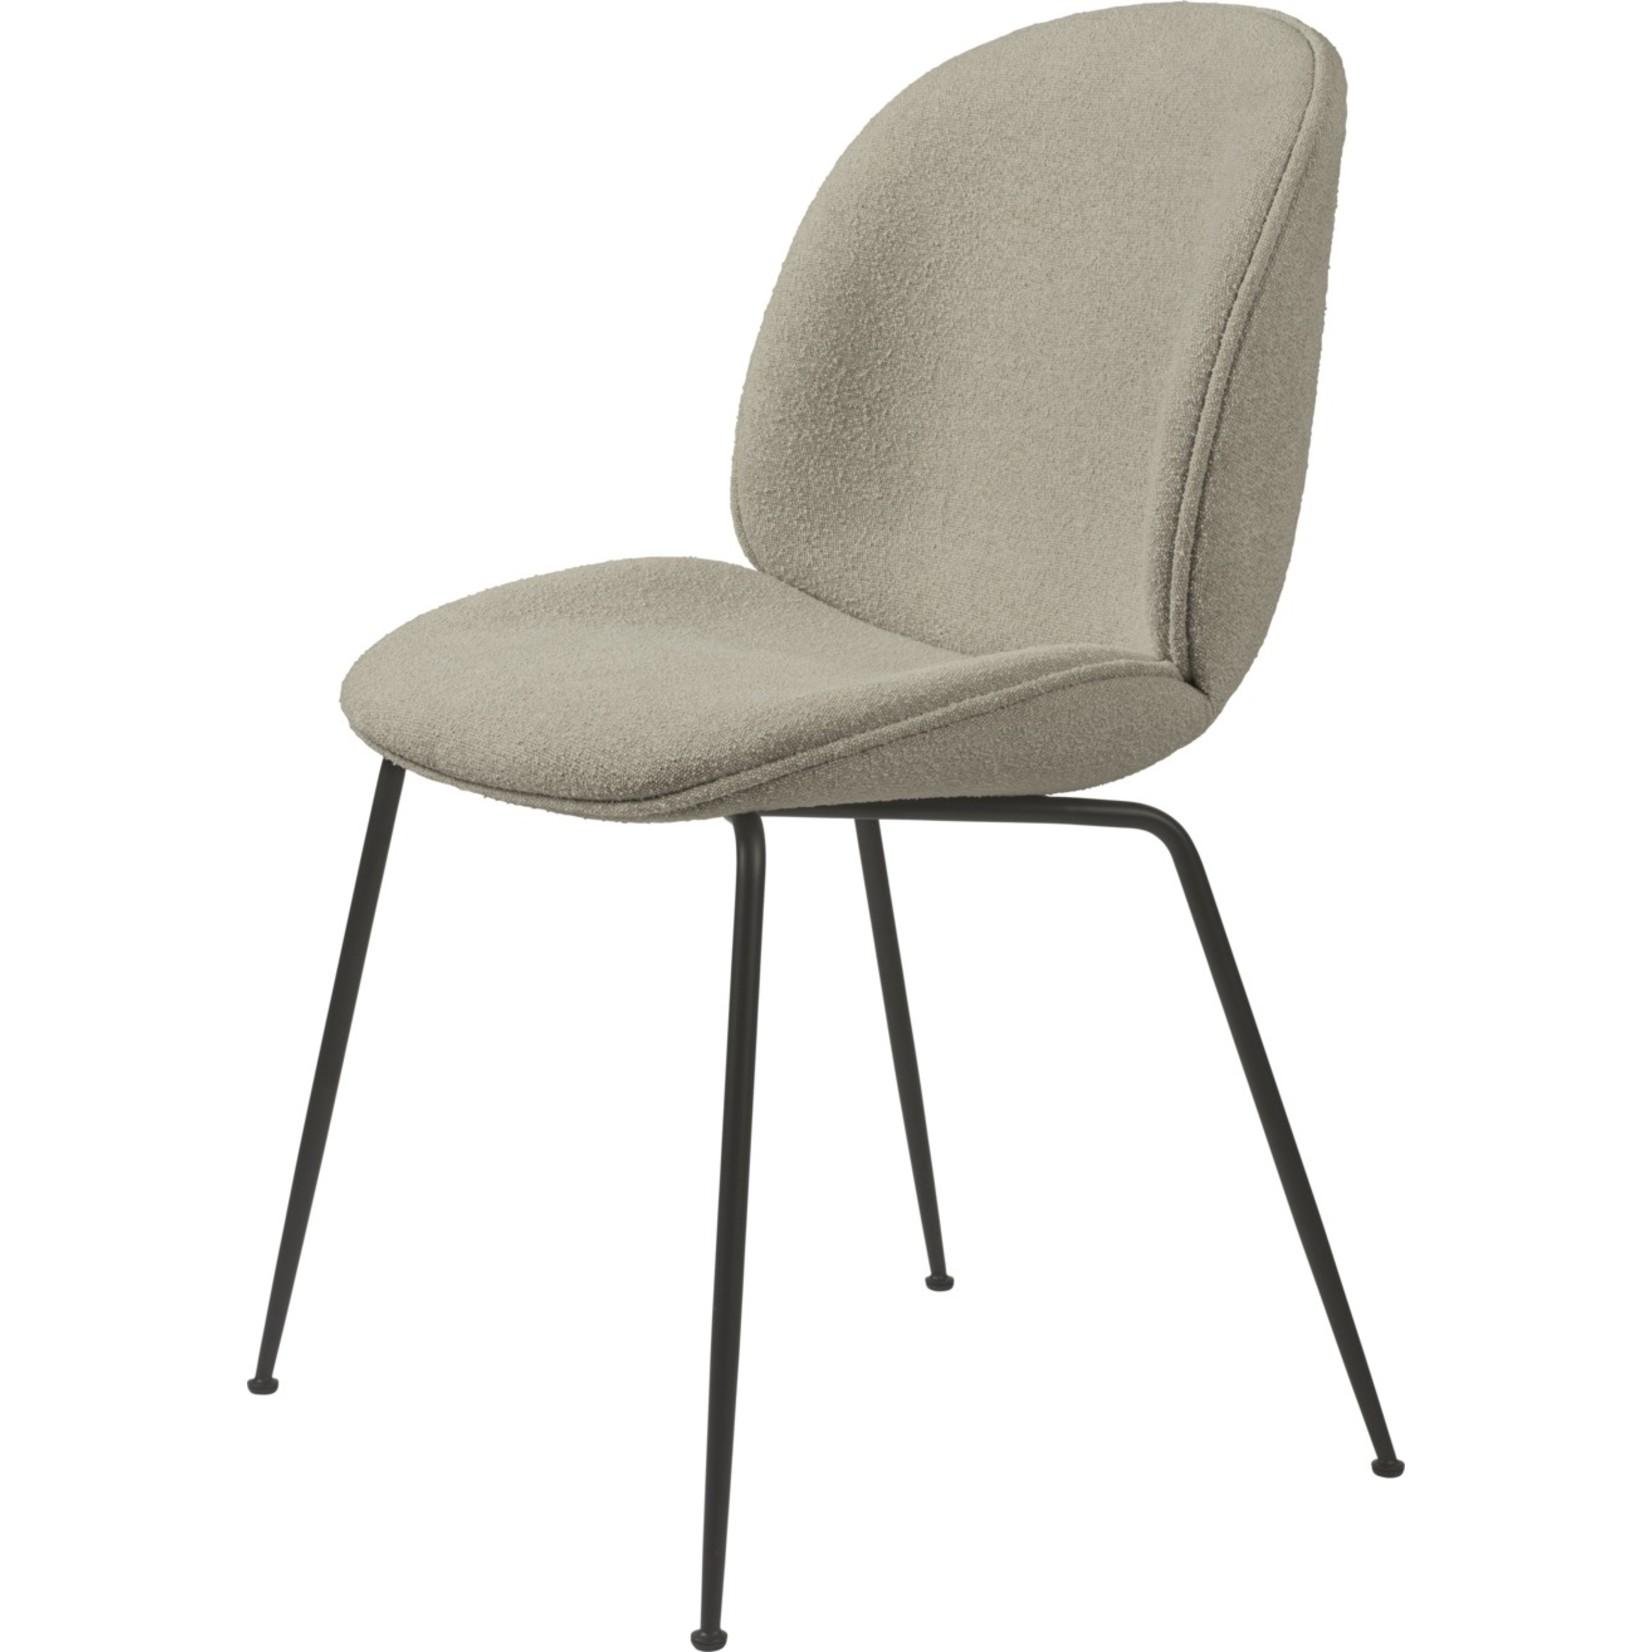 Gubi Beetle Dining Chair | Light Boucle 008 & Black Matt Base